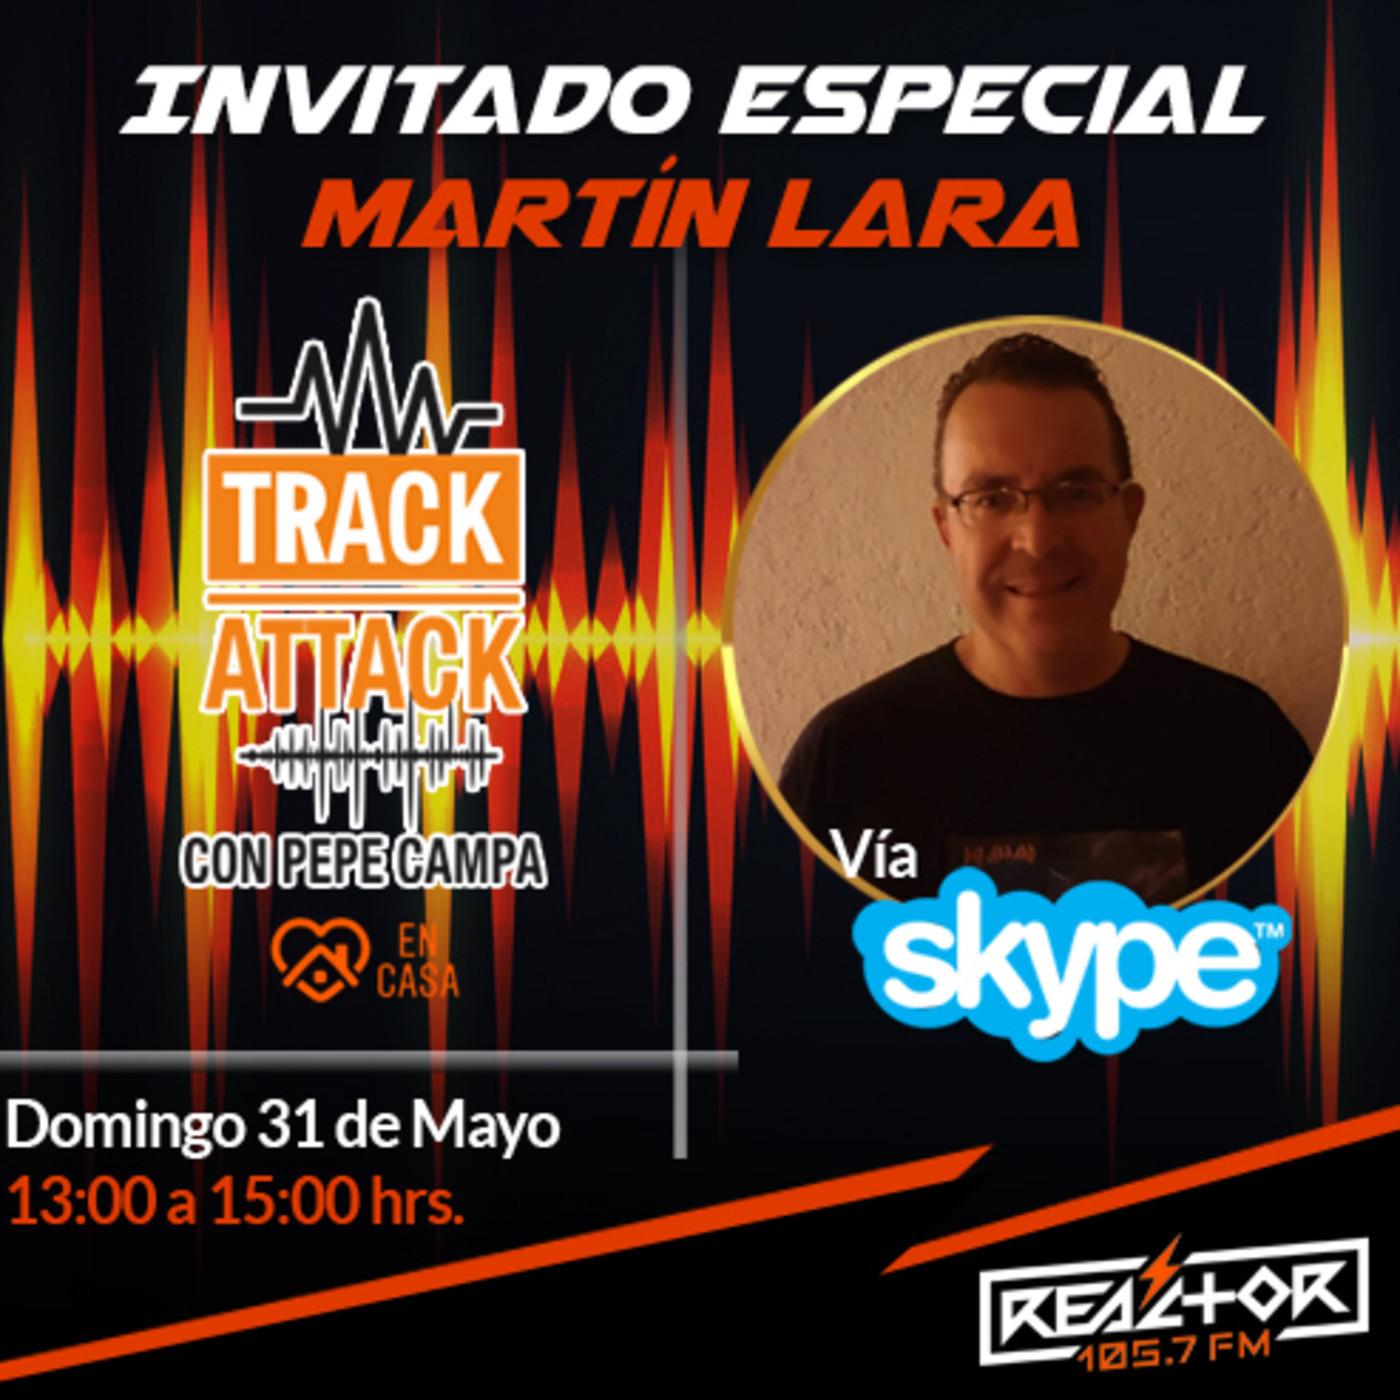 Track Attack 31 de Mayo 2020